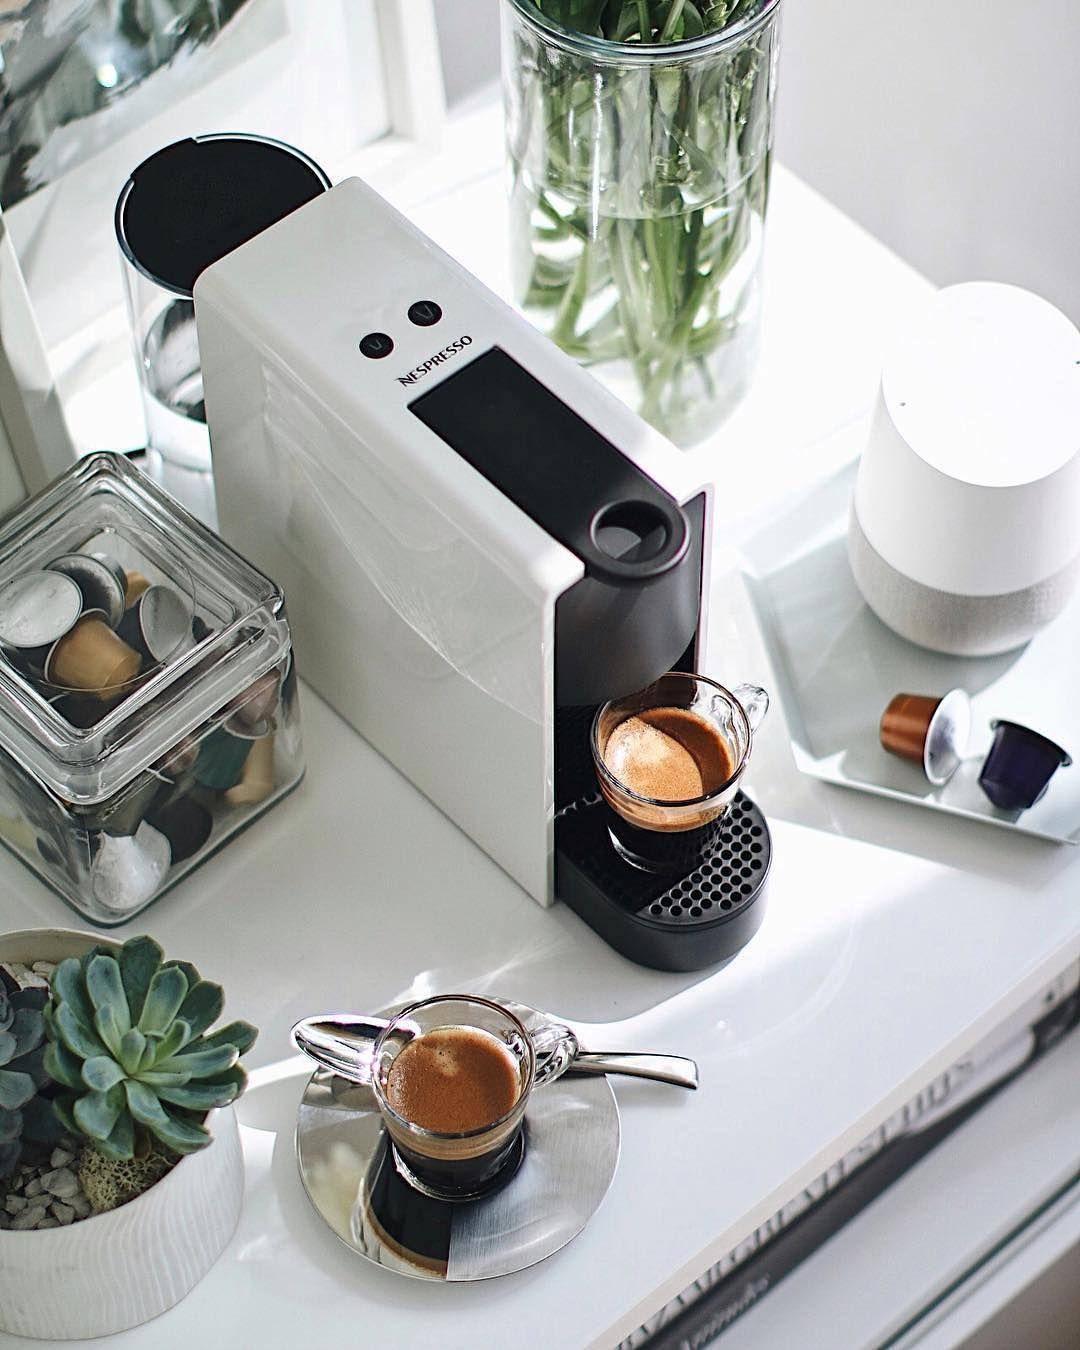 Pinterest: @CoffeeQueen4 Thank you xoxo | Coffee kitchen, Coffee bar home,  Coffee station kitchen